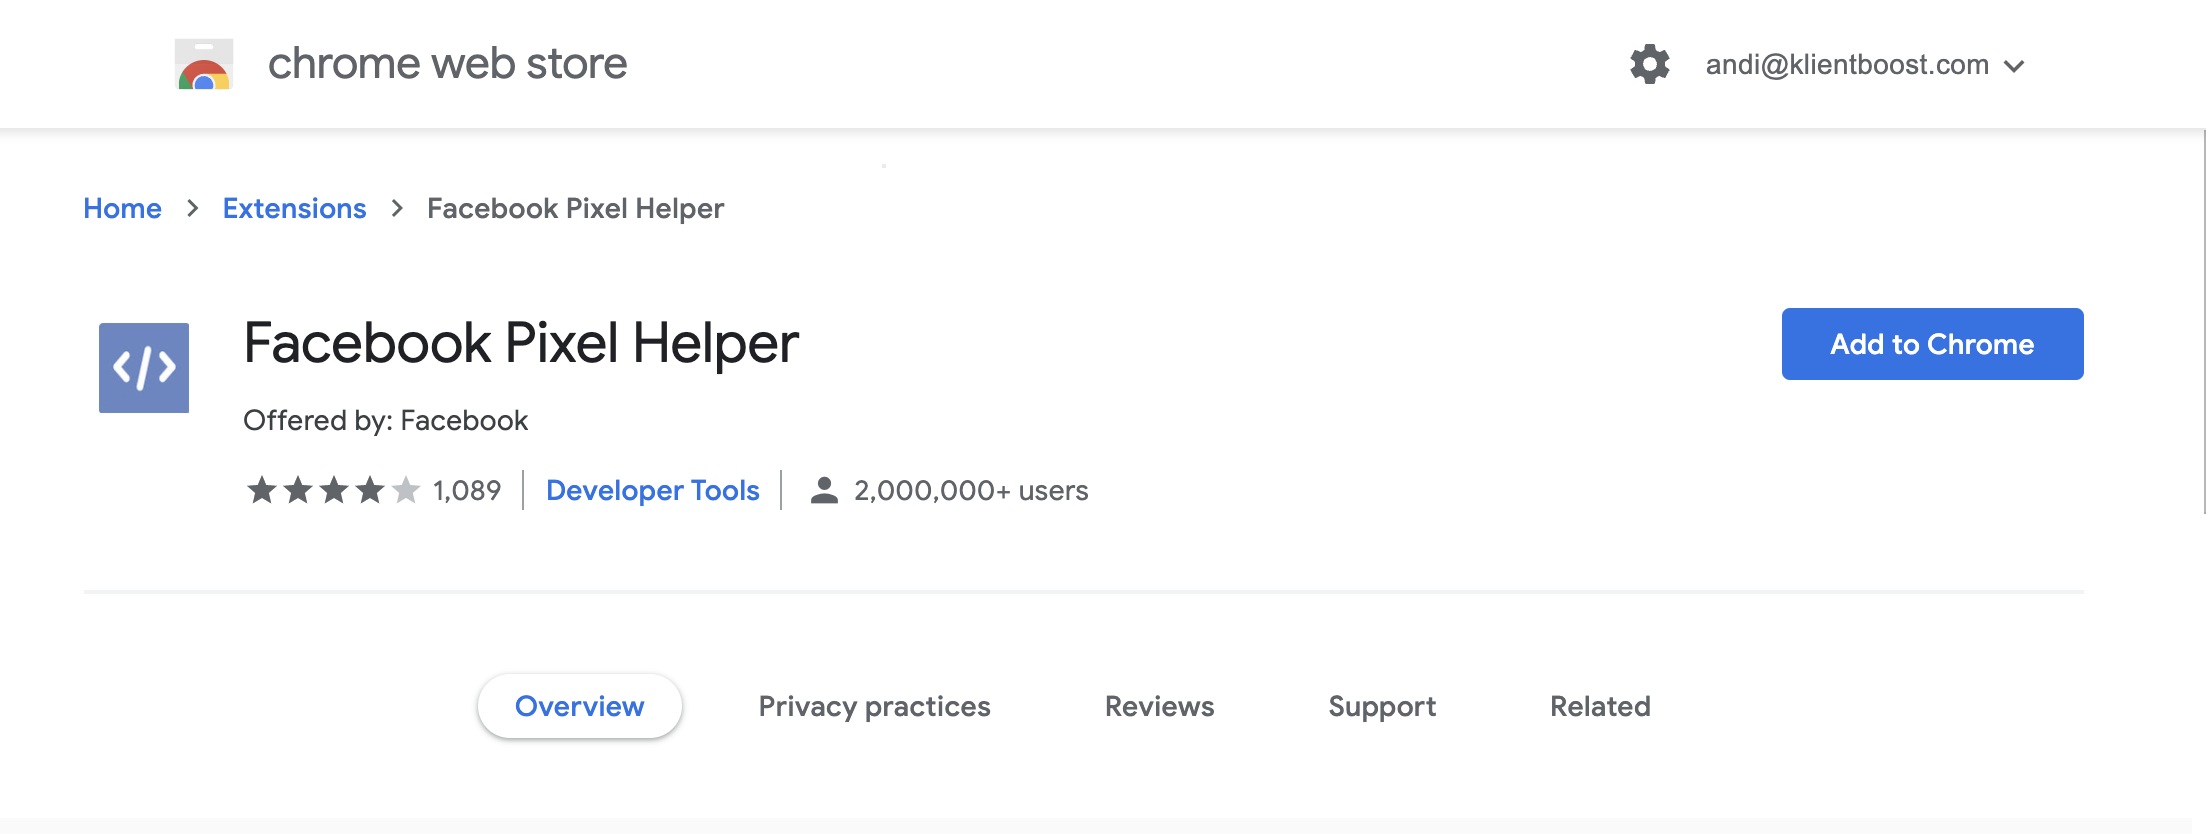 Install the Facebook Pixel Helper Chrome extension